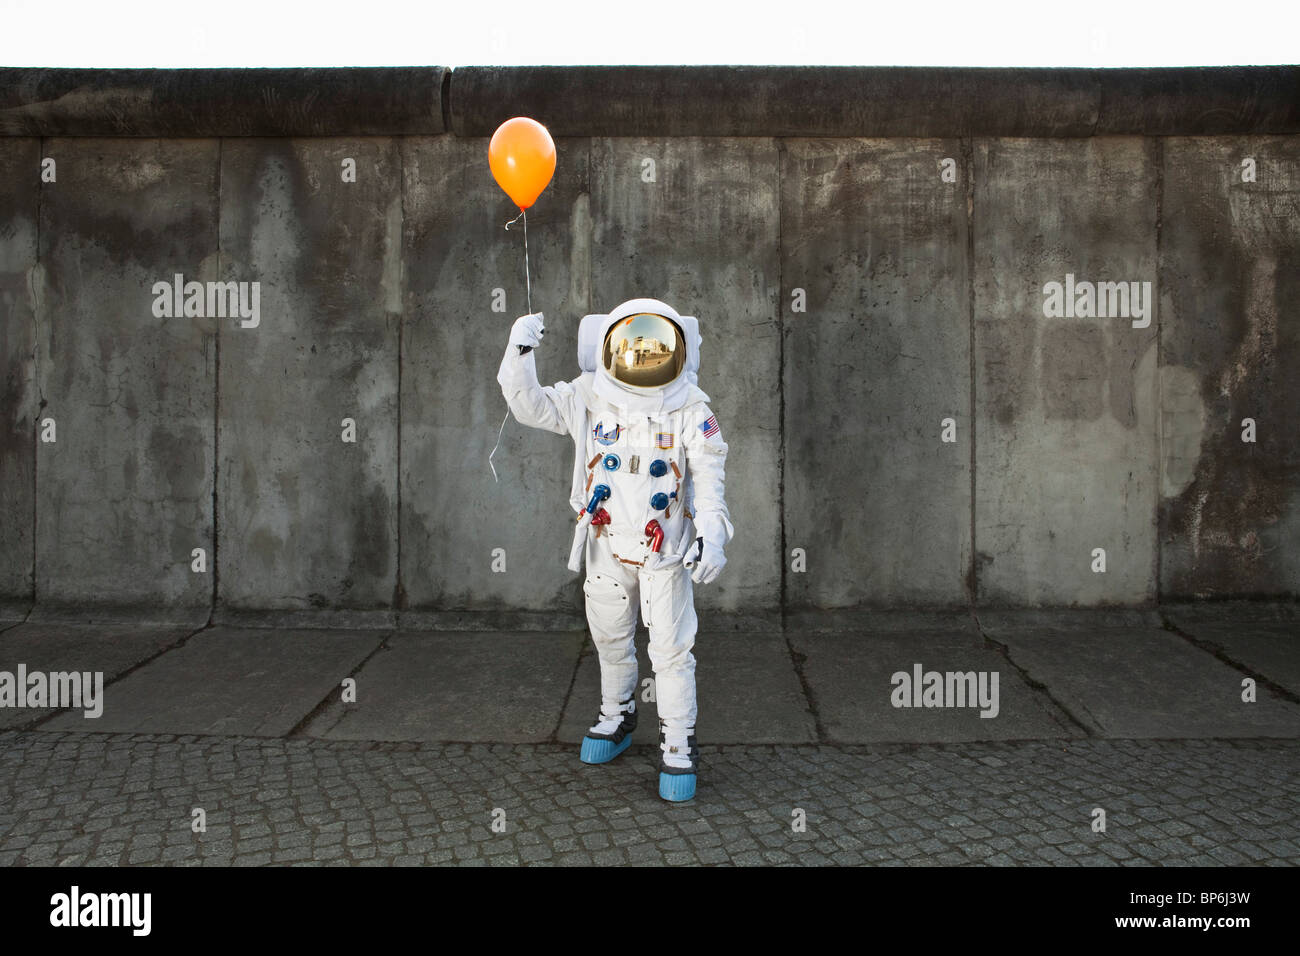 An astronaut on a city sidewalk holding a balloon - Stock Image